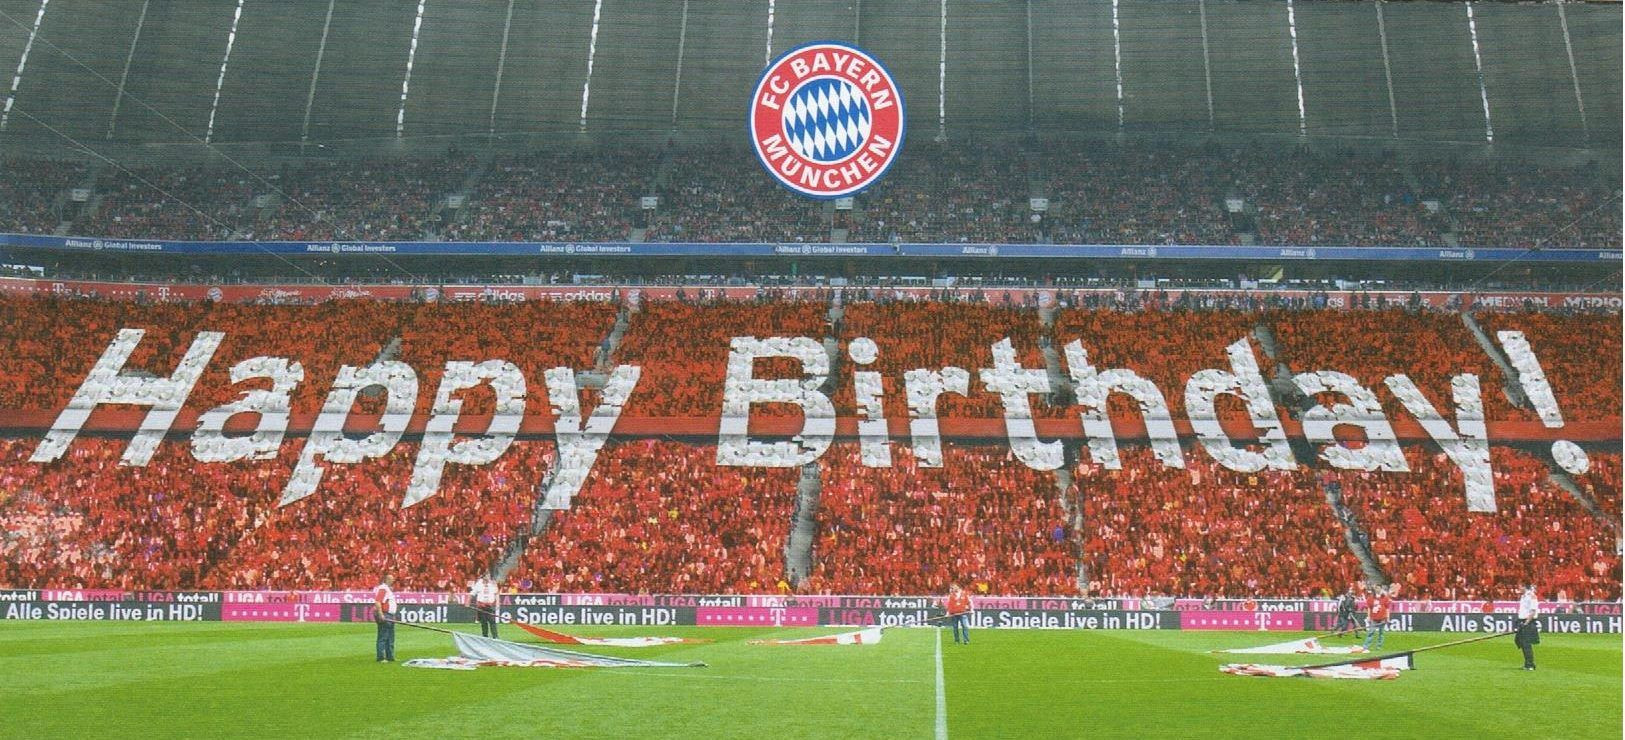 Geburtstagswünsche Fussball  Perfekte Geburtstagsgrüße Glückwünsche Grüße